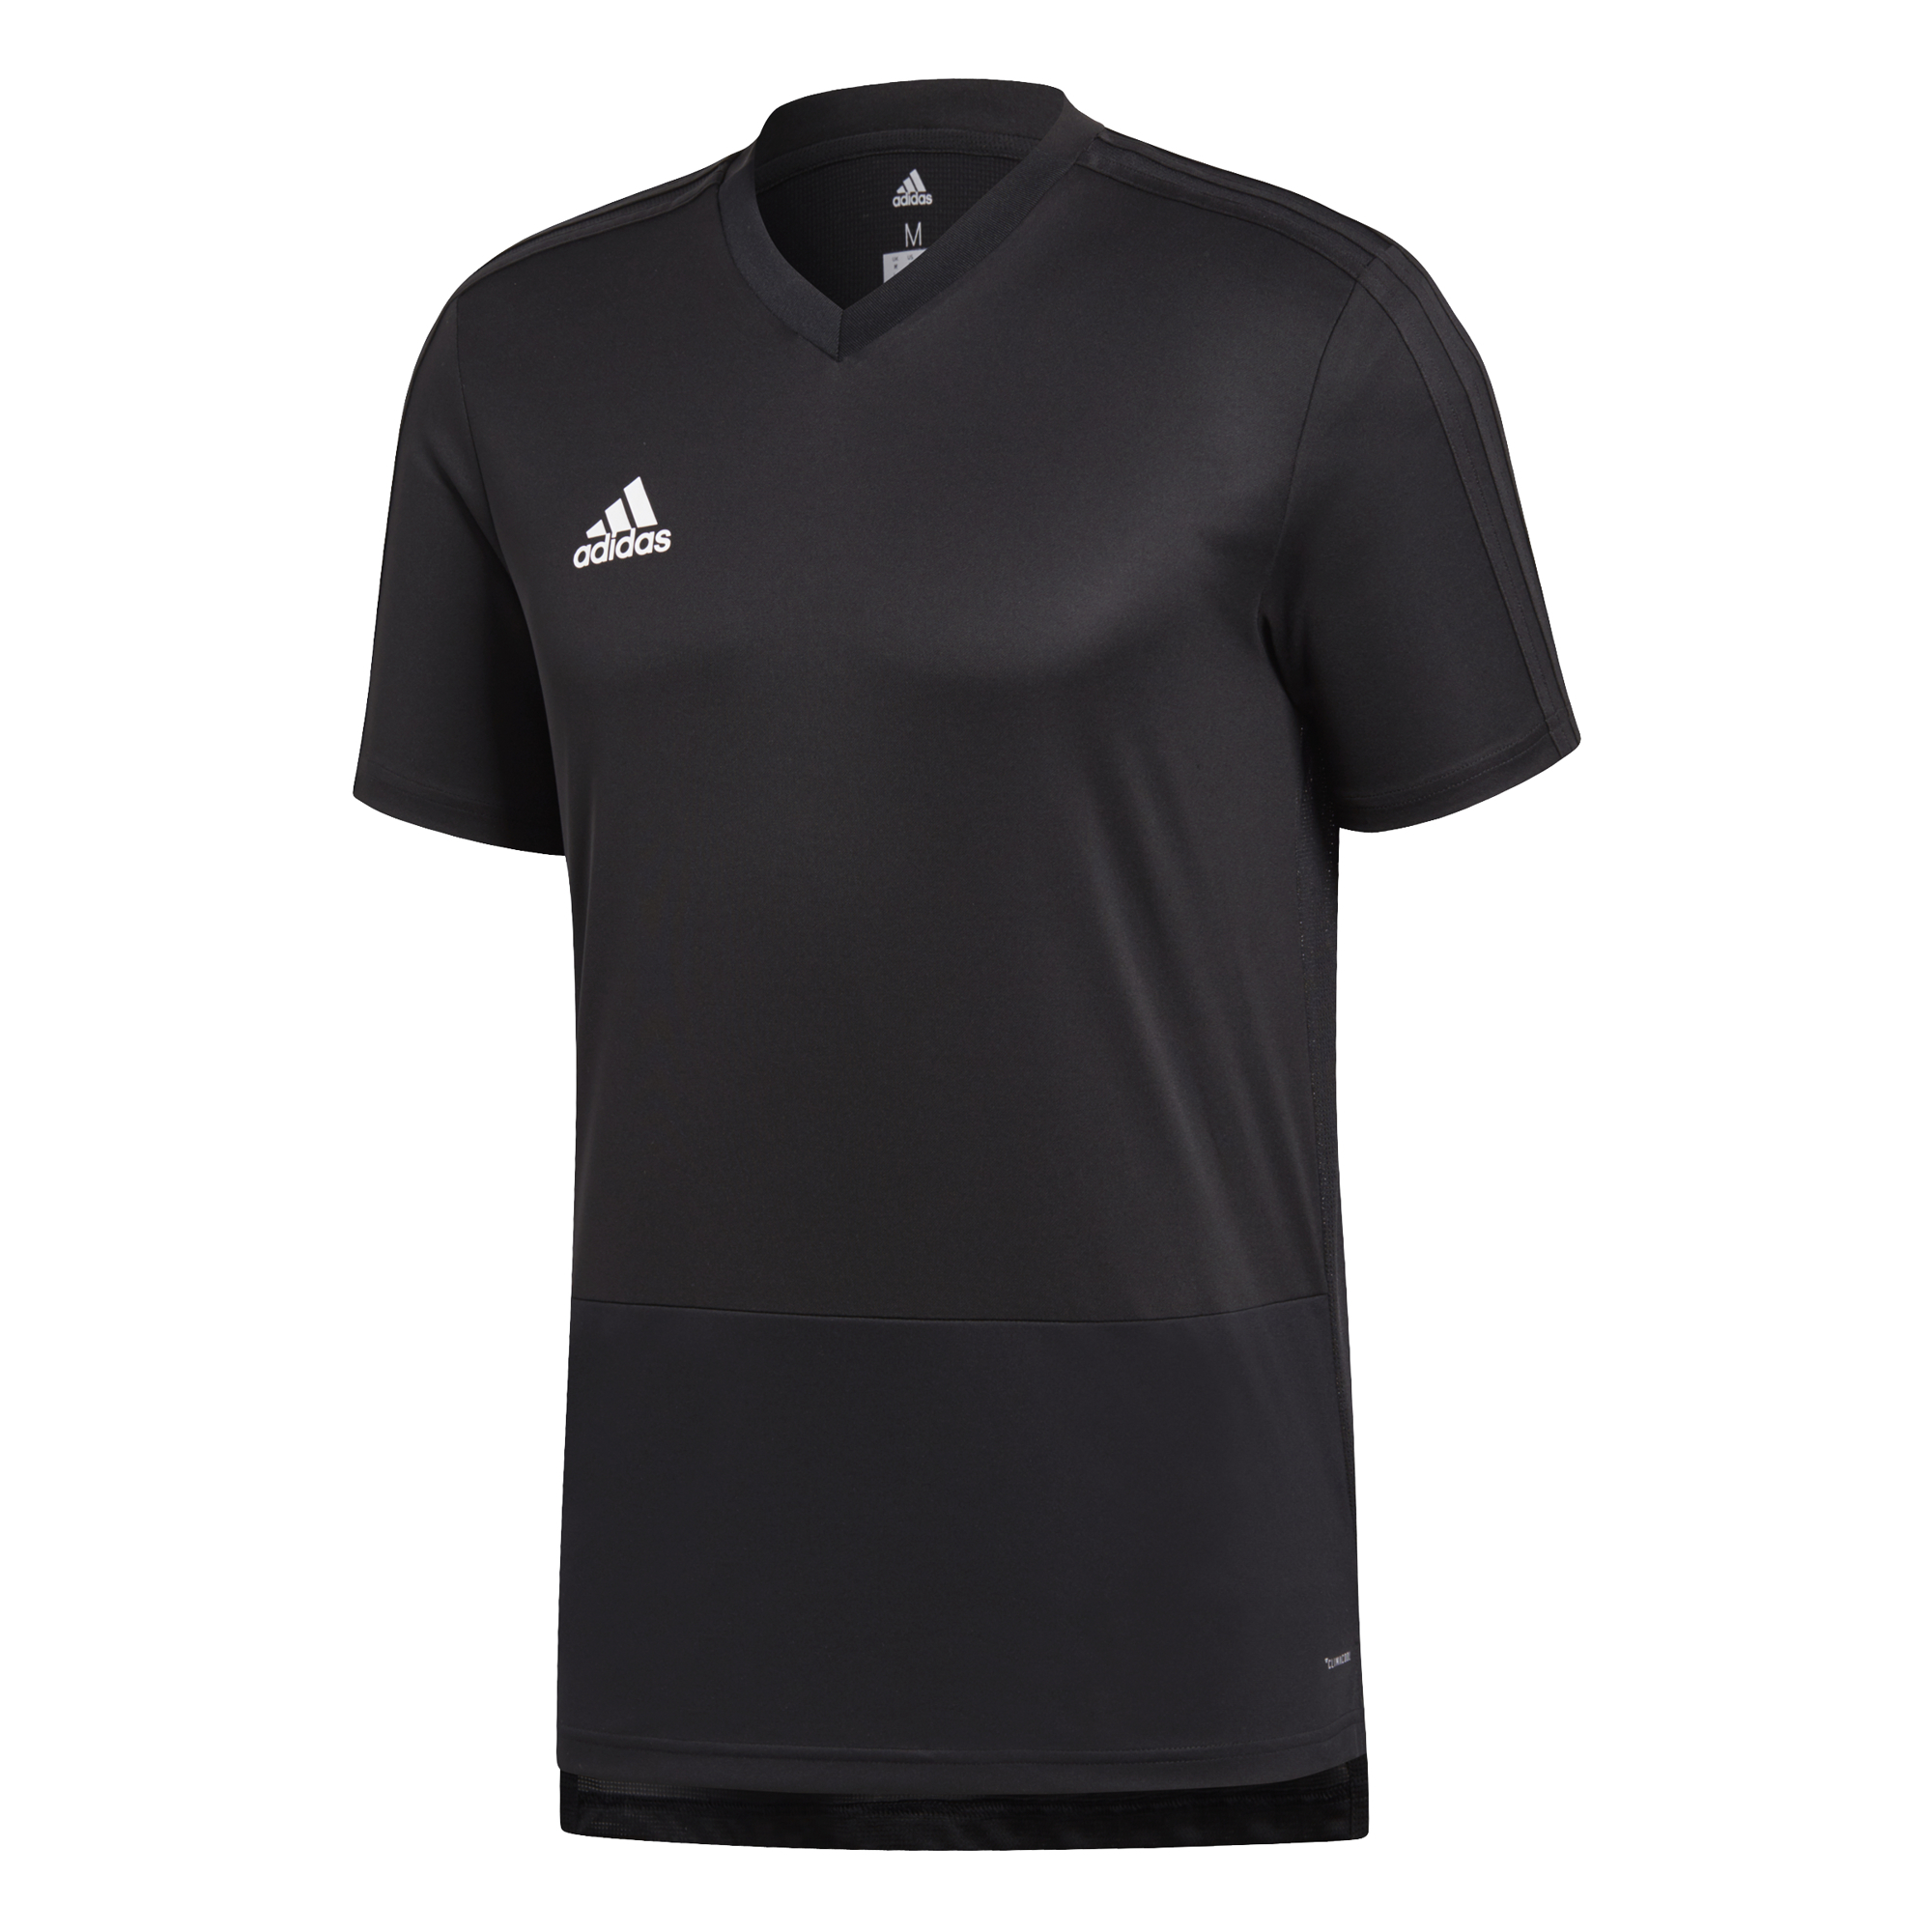 ADIDAS tréninkové triko Condivo 18